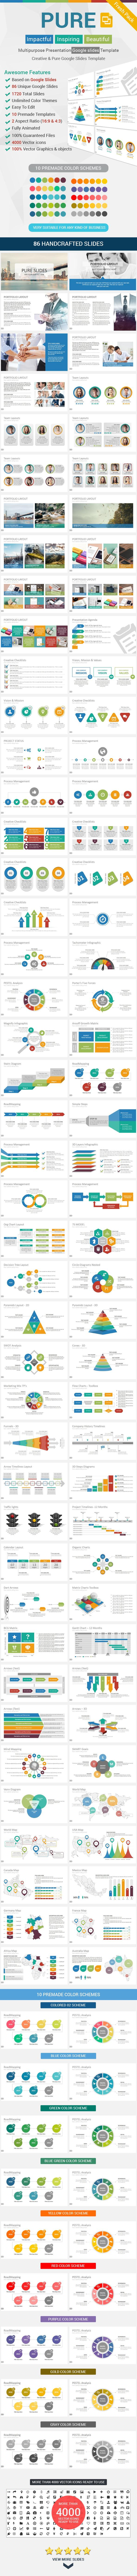 Pure Google Slides Presentation Template - Google Slides Presentation Templates